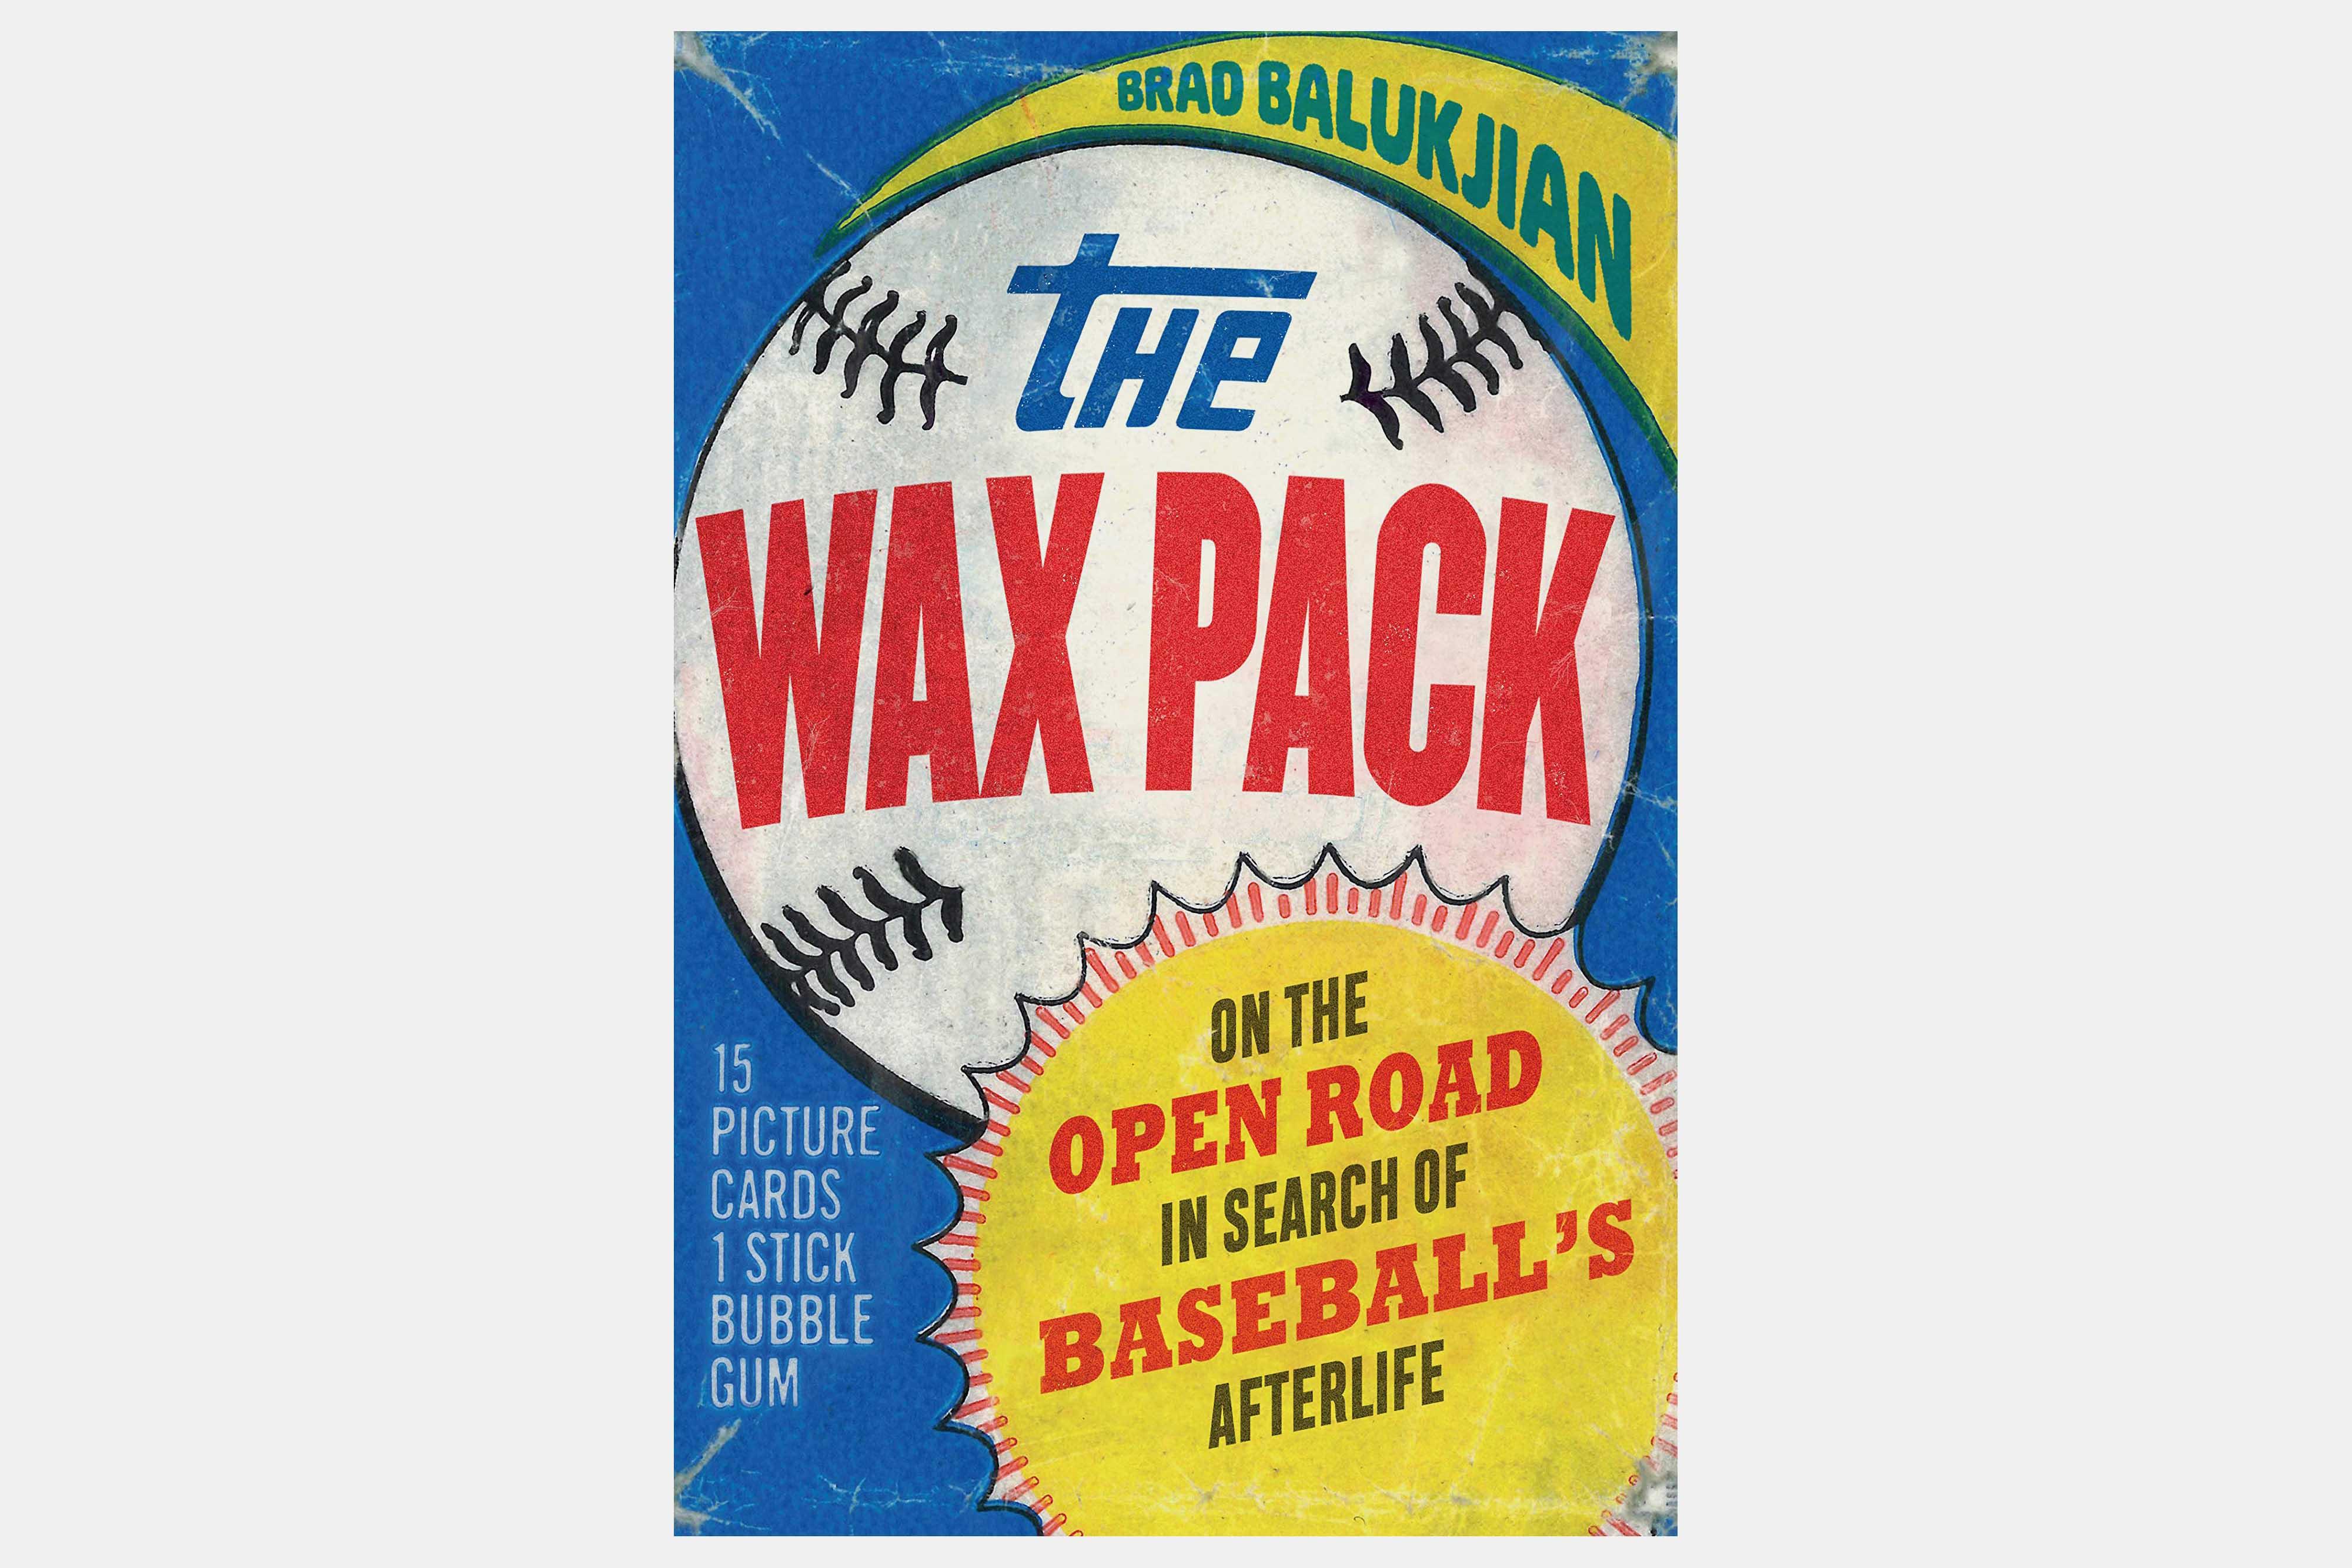 wax pack brad balukjian